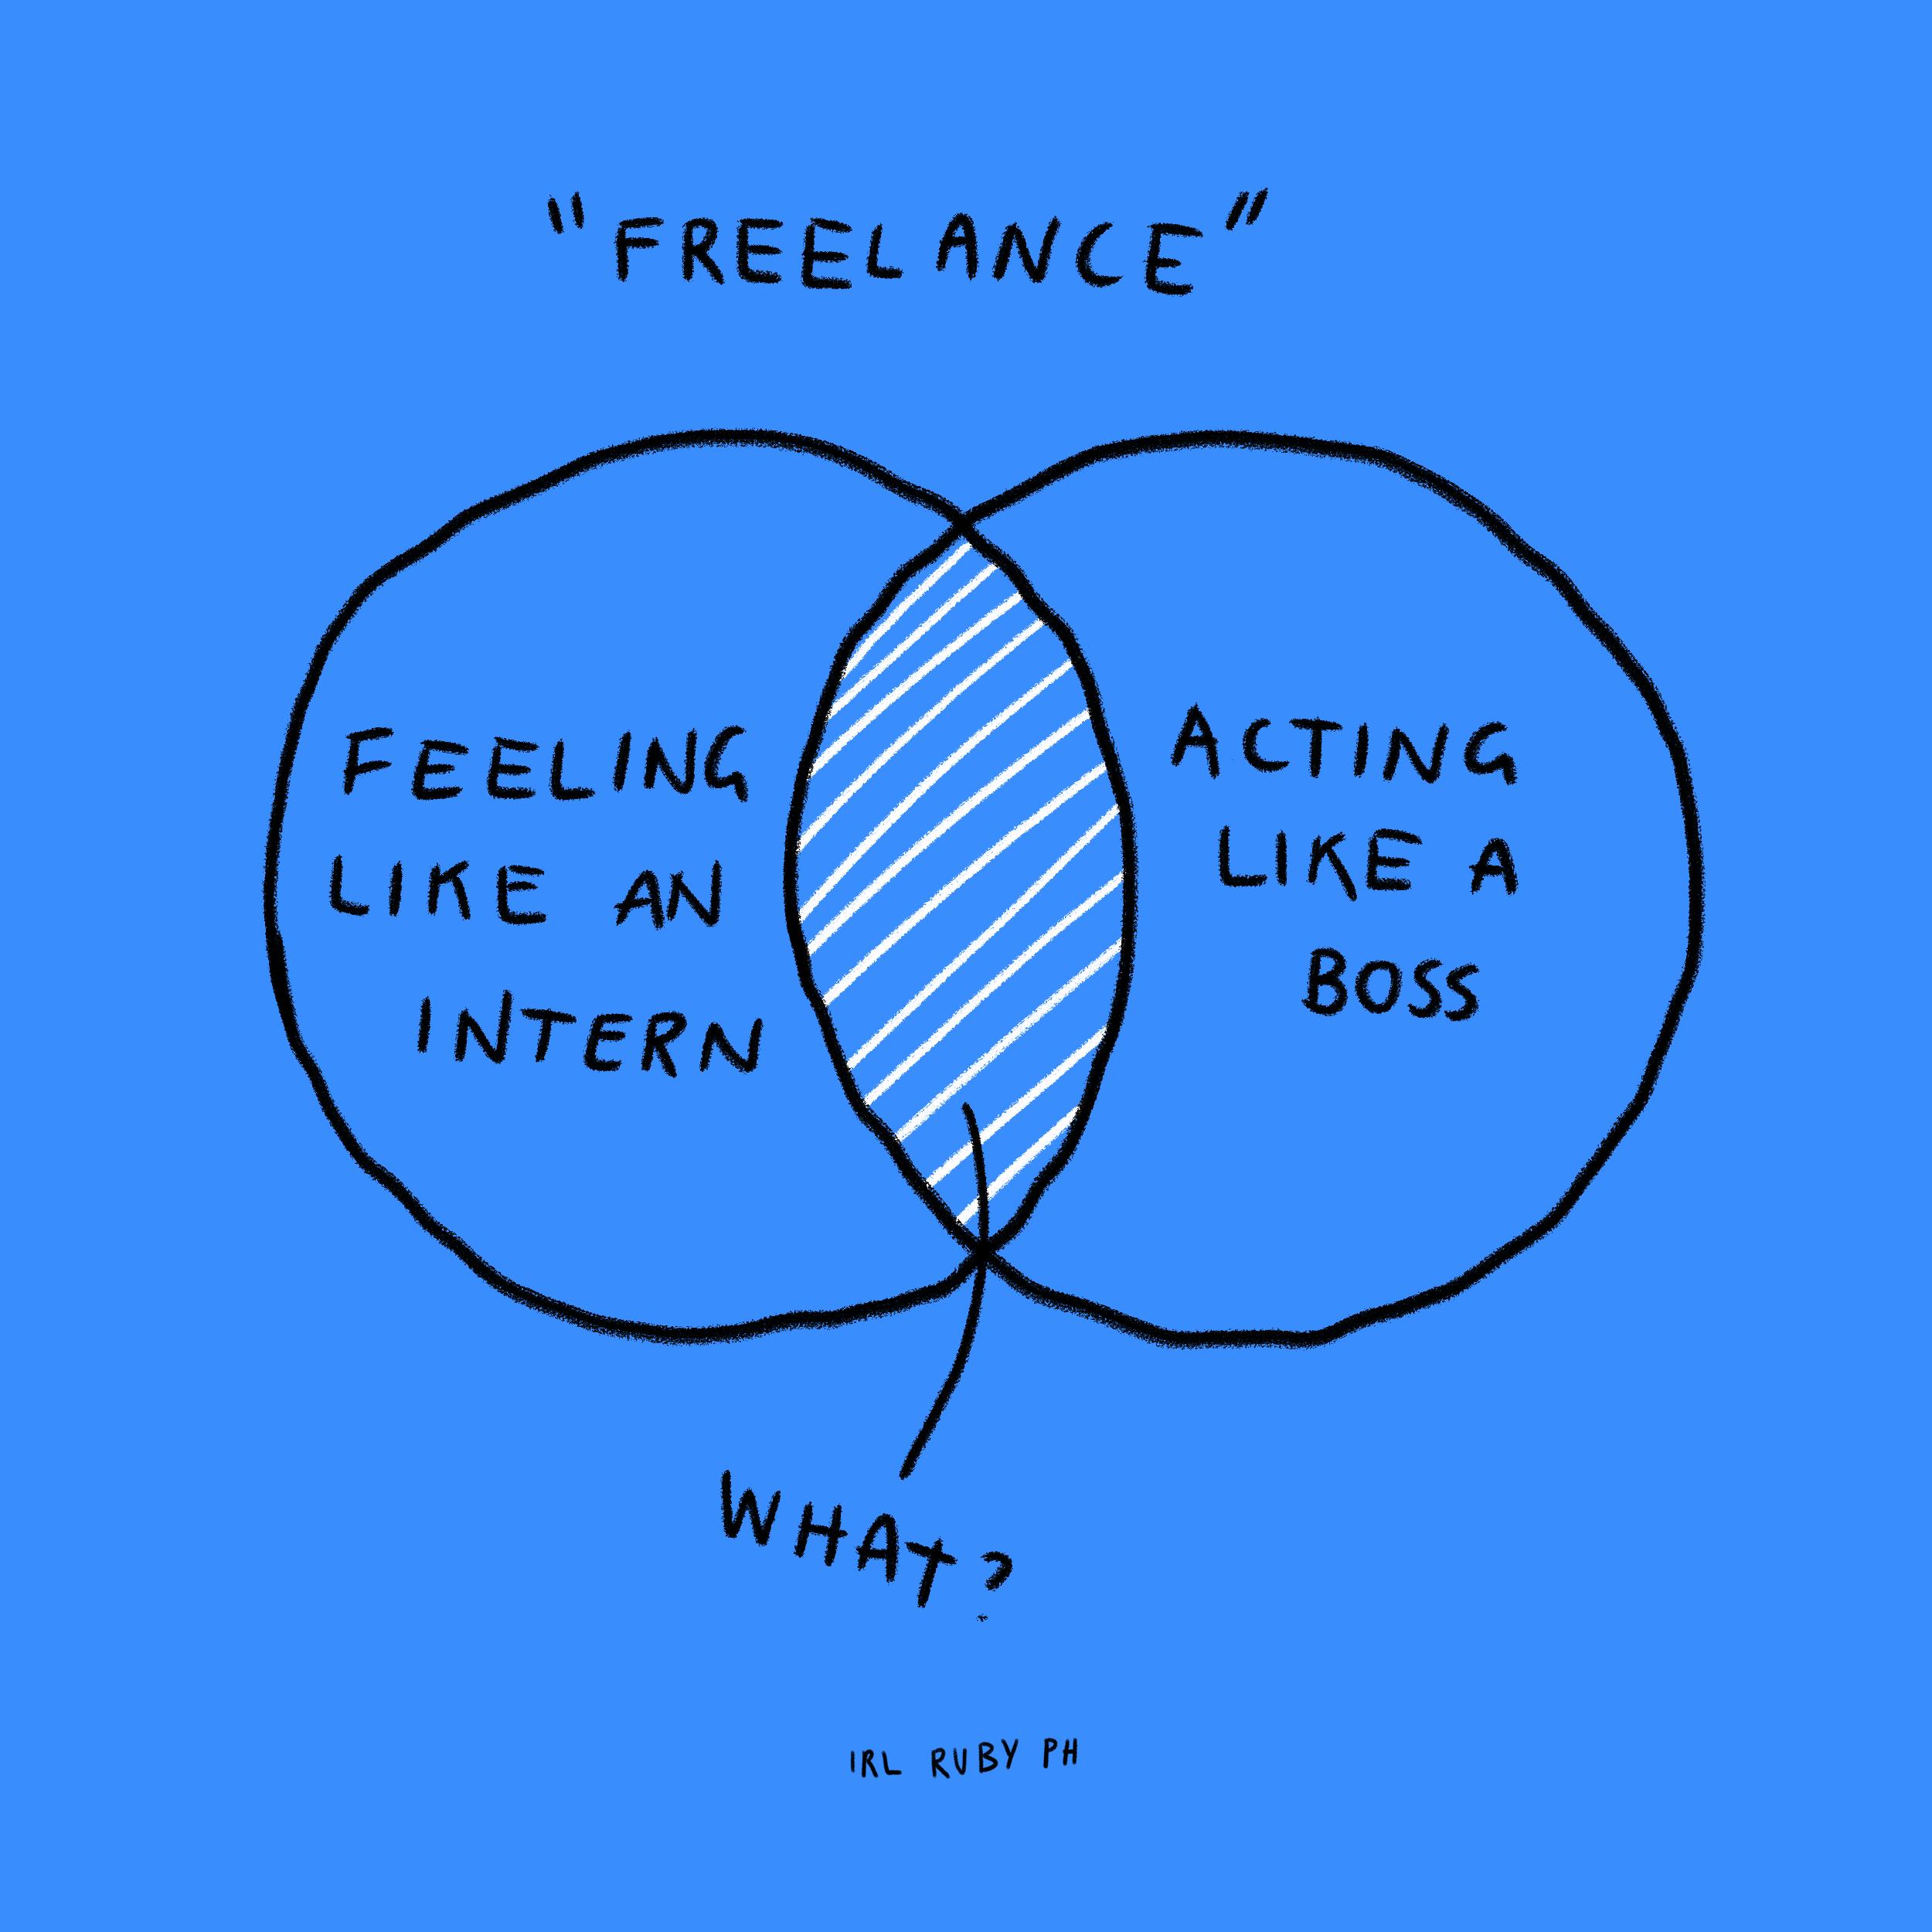 The Freelance Model - 2018